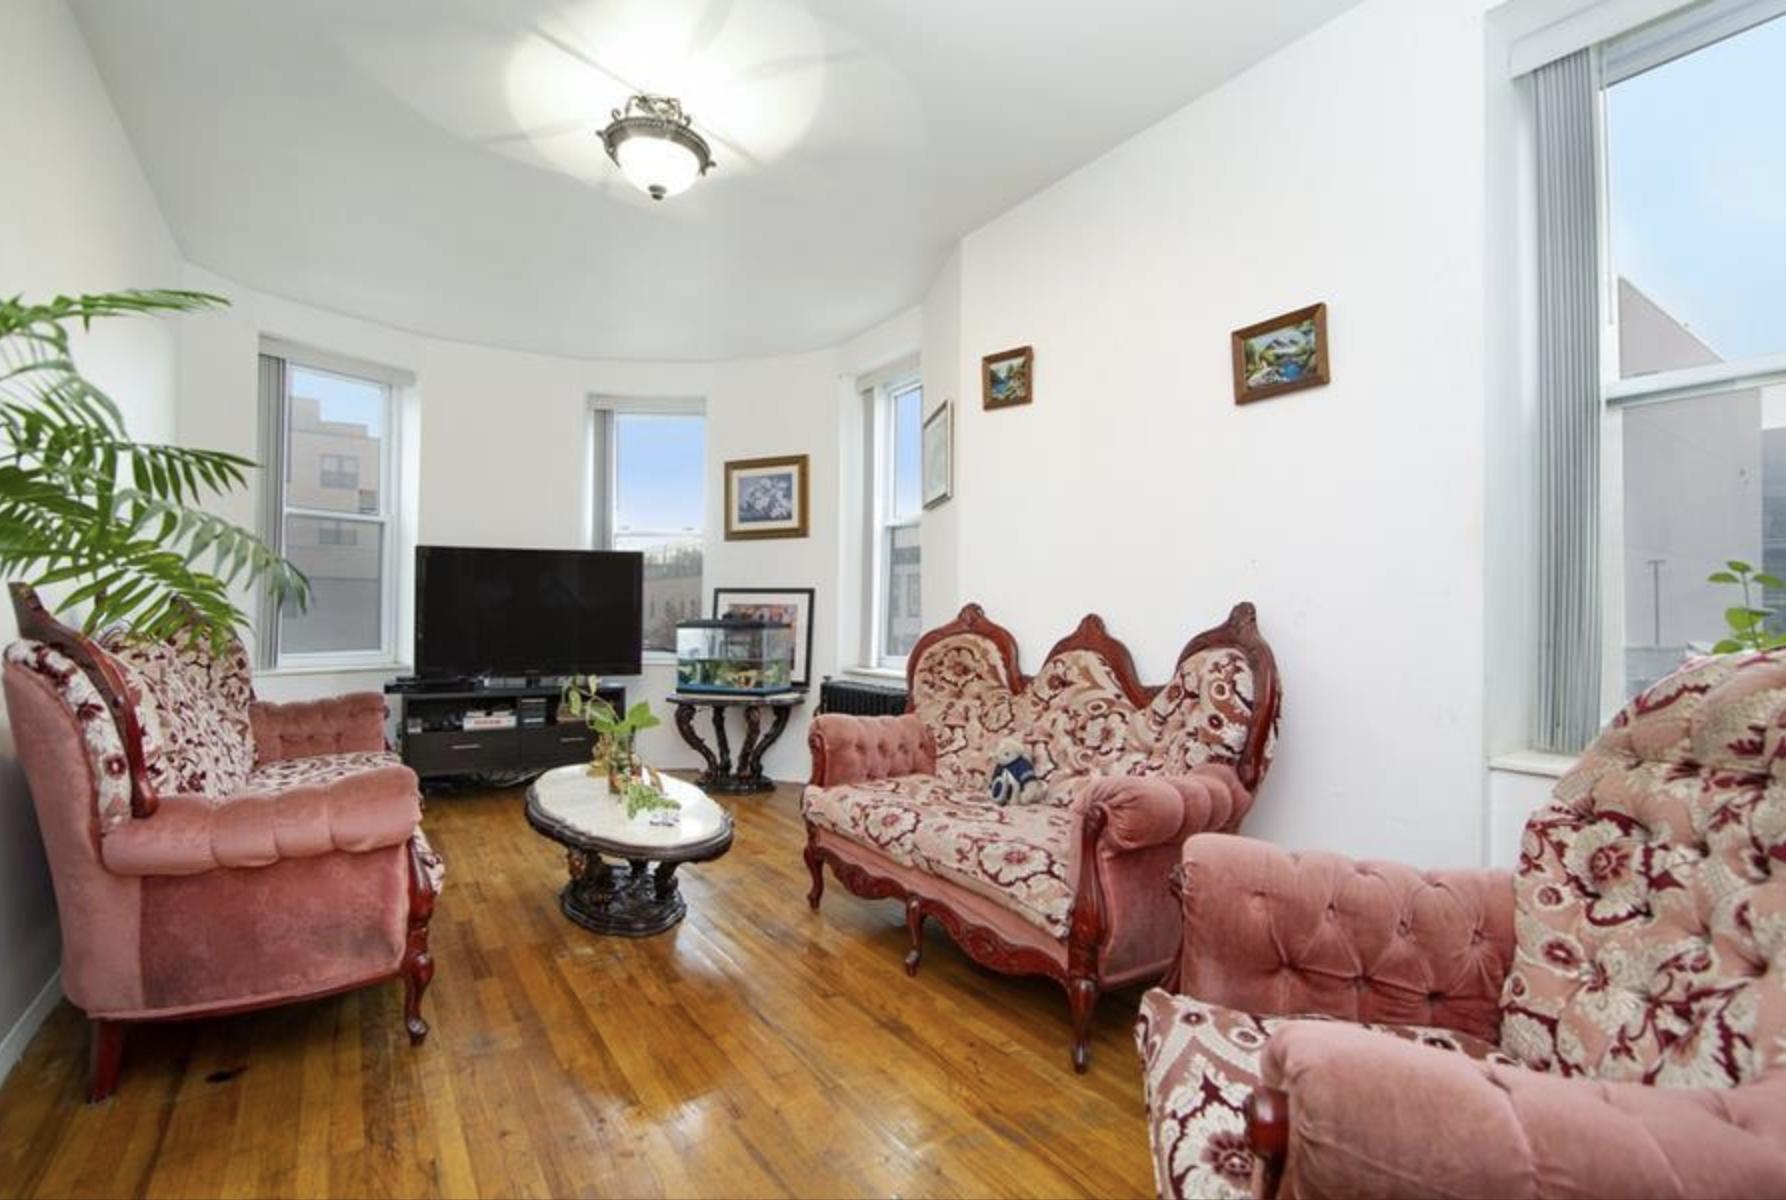 15 Kosciuszko St, #3A - Park Slope | Brooklyn    2 Bedroom // 1 Bath Days on Market — 50 Sold Price:    $629,000